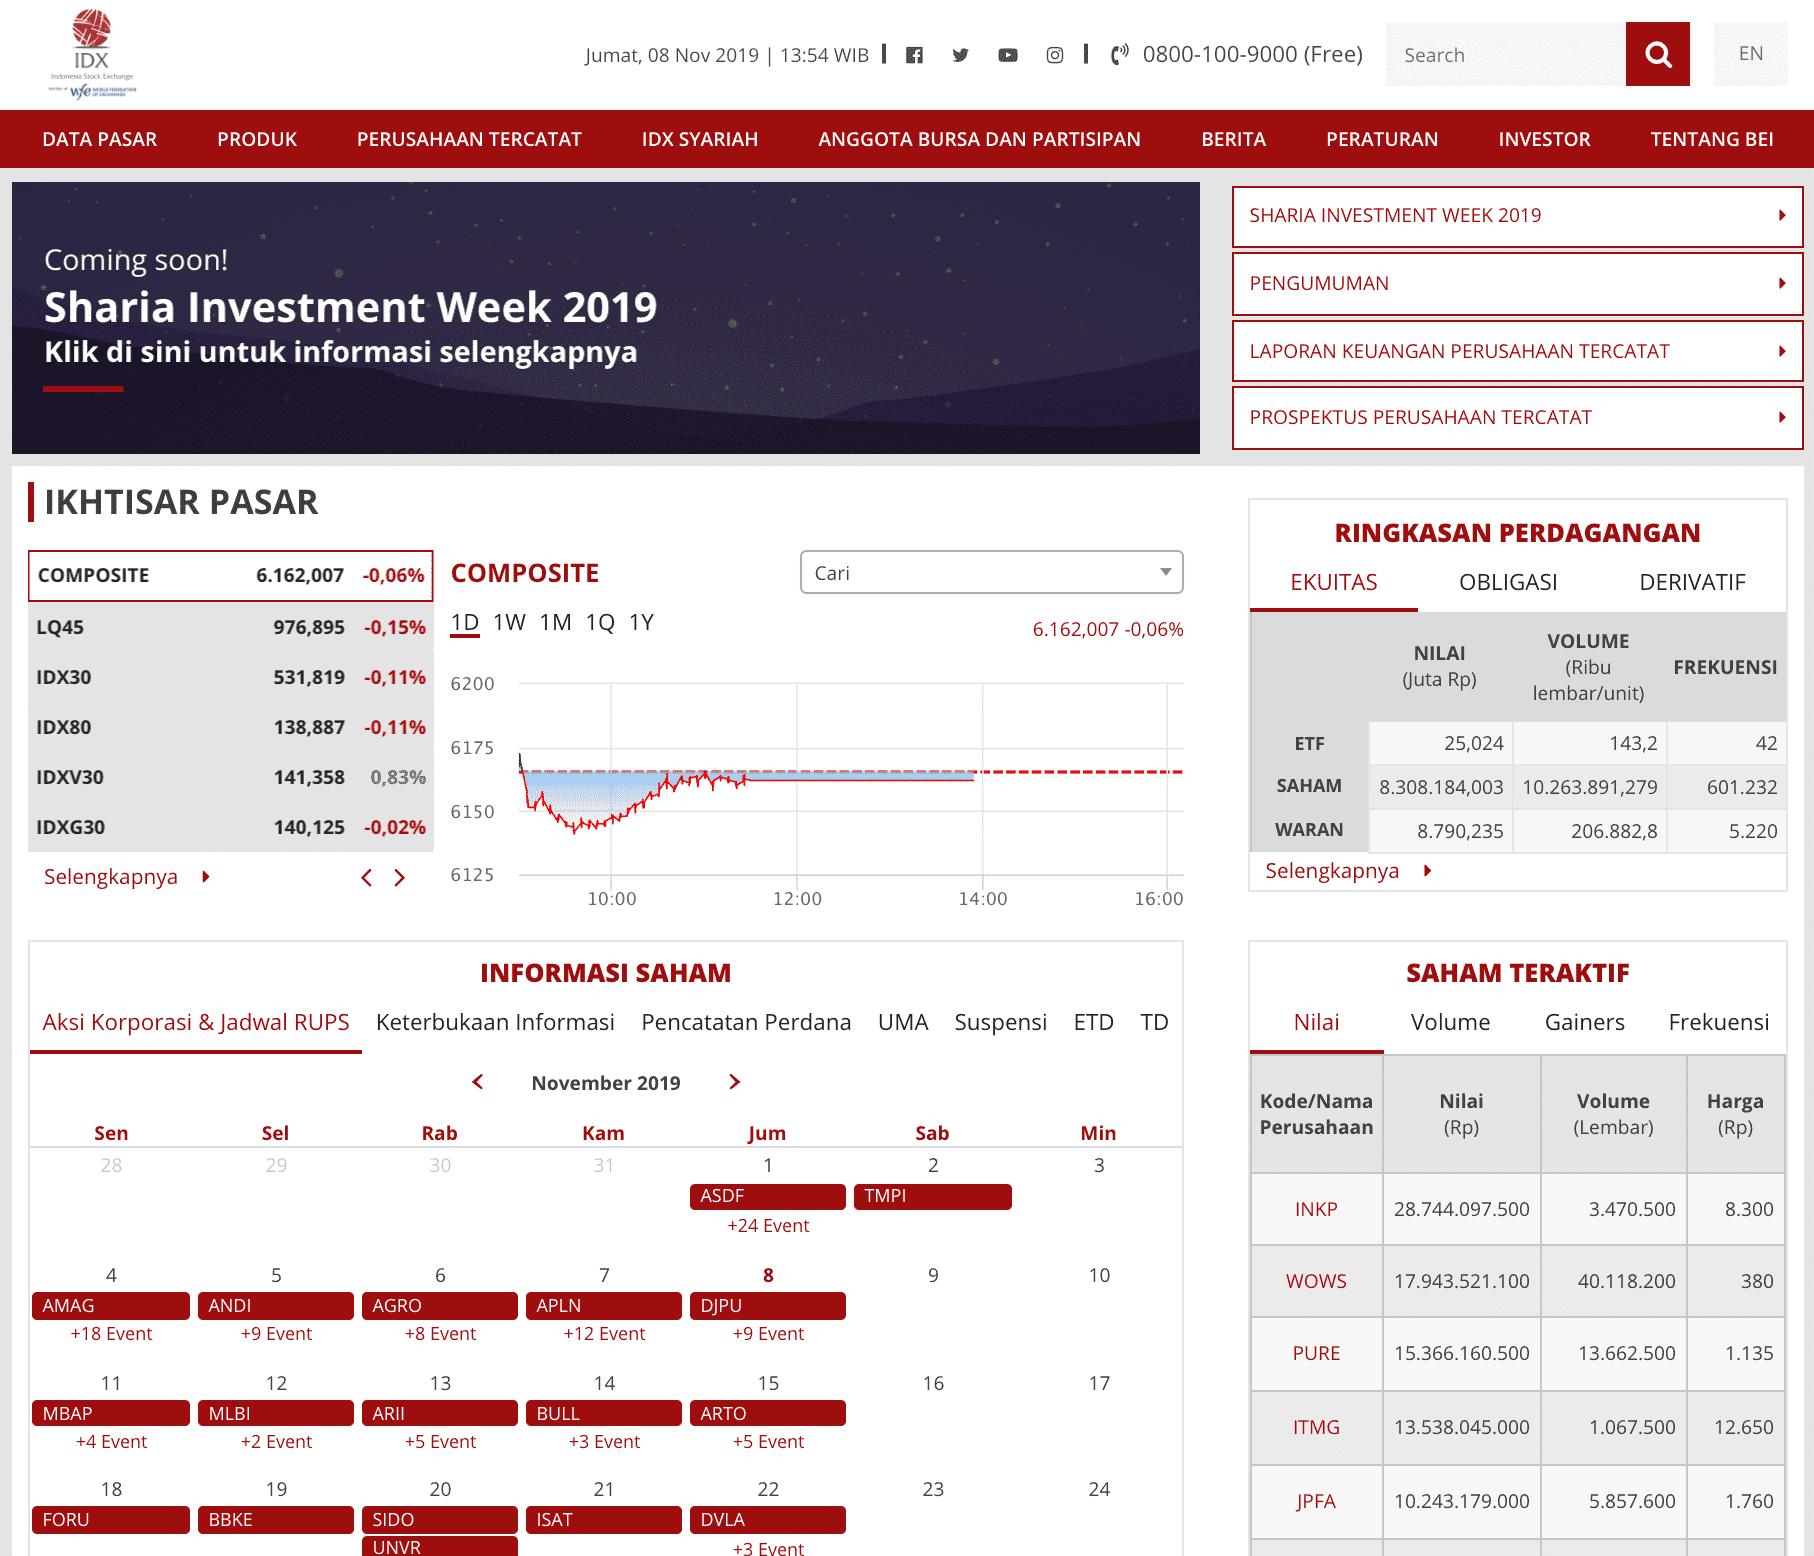 15 Aspek Bursa Efek Indonesia Buat Investasi Saham Pemula 2019 Duwitmu